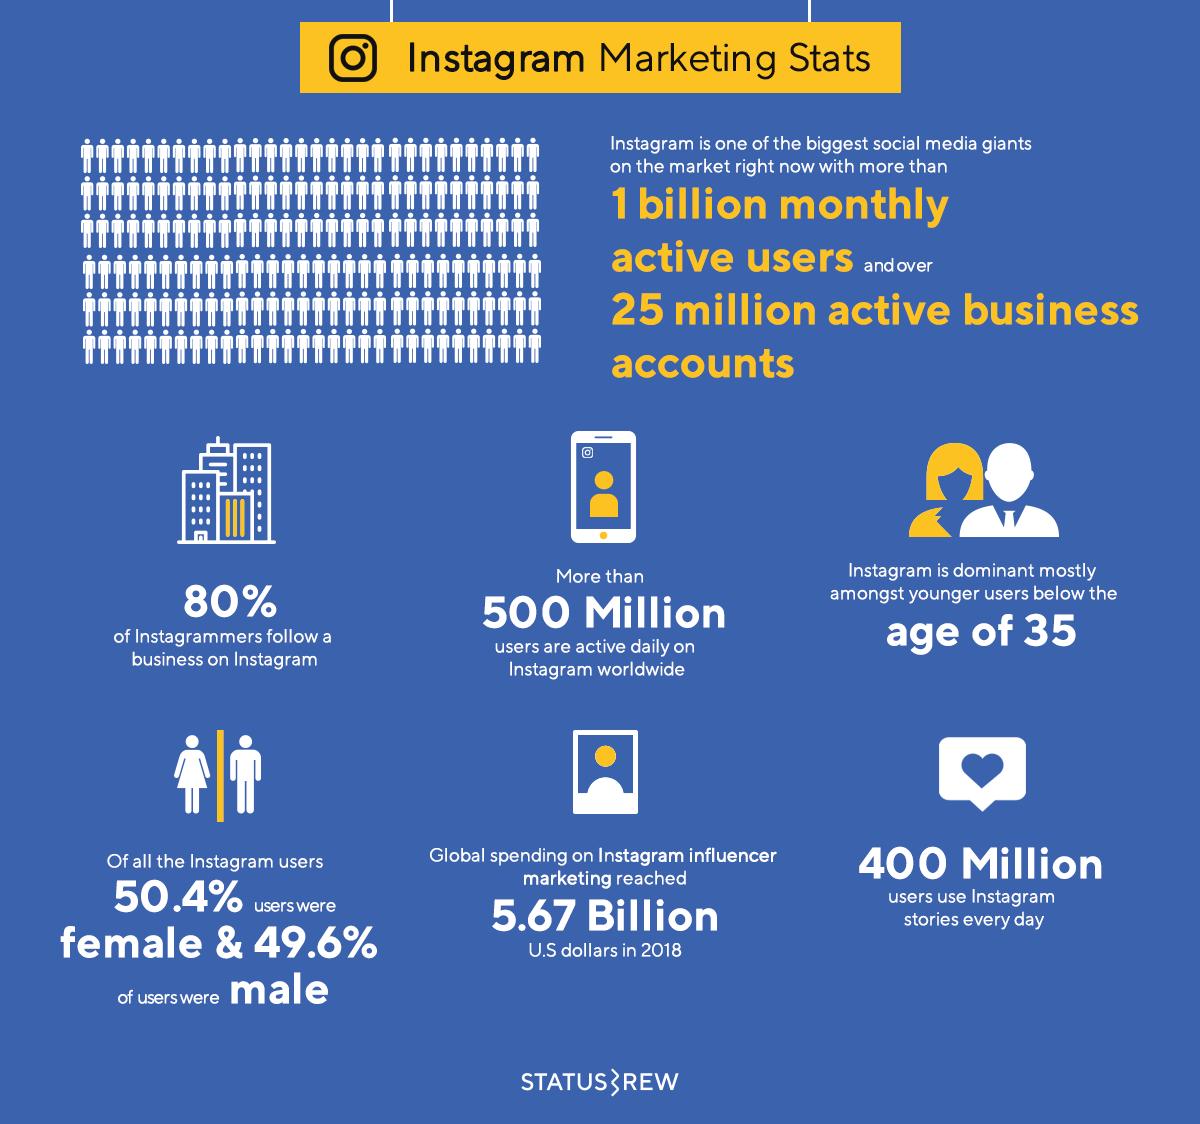 Instagram Marketing Statistics Infographic